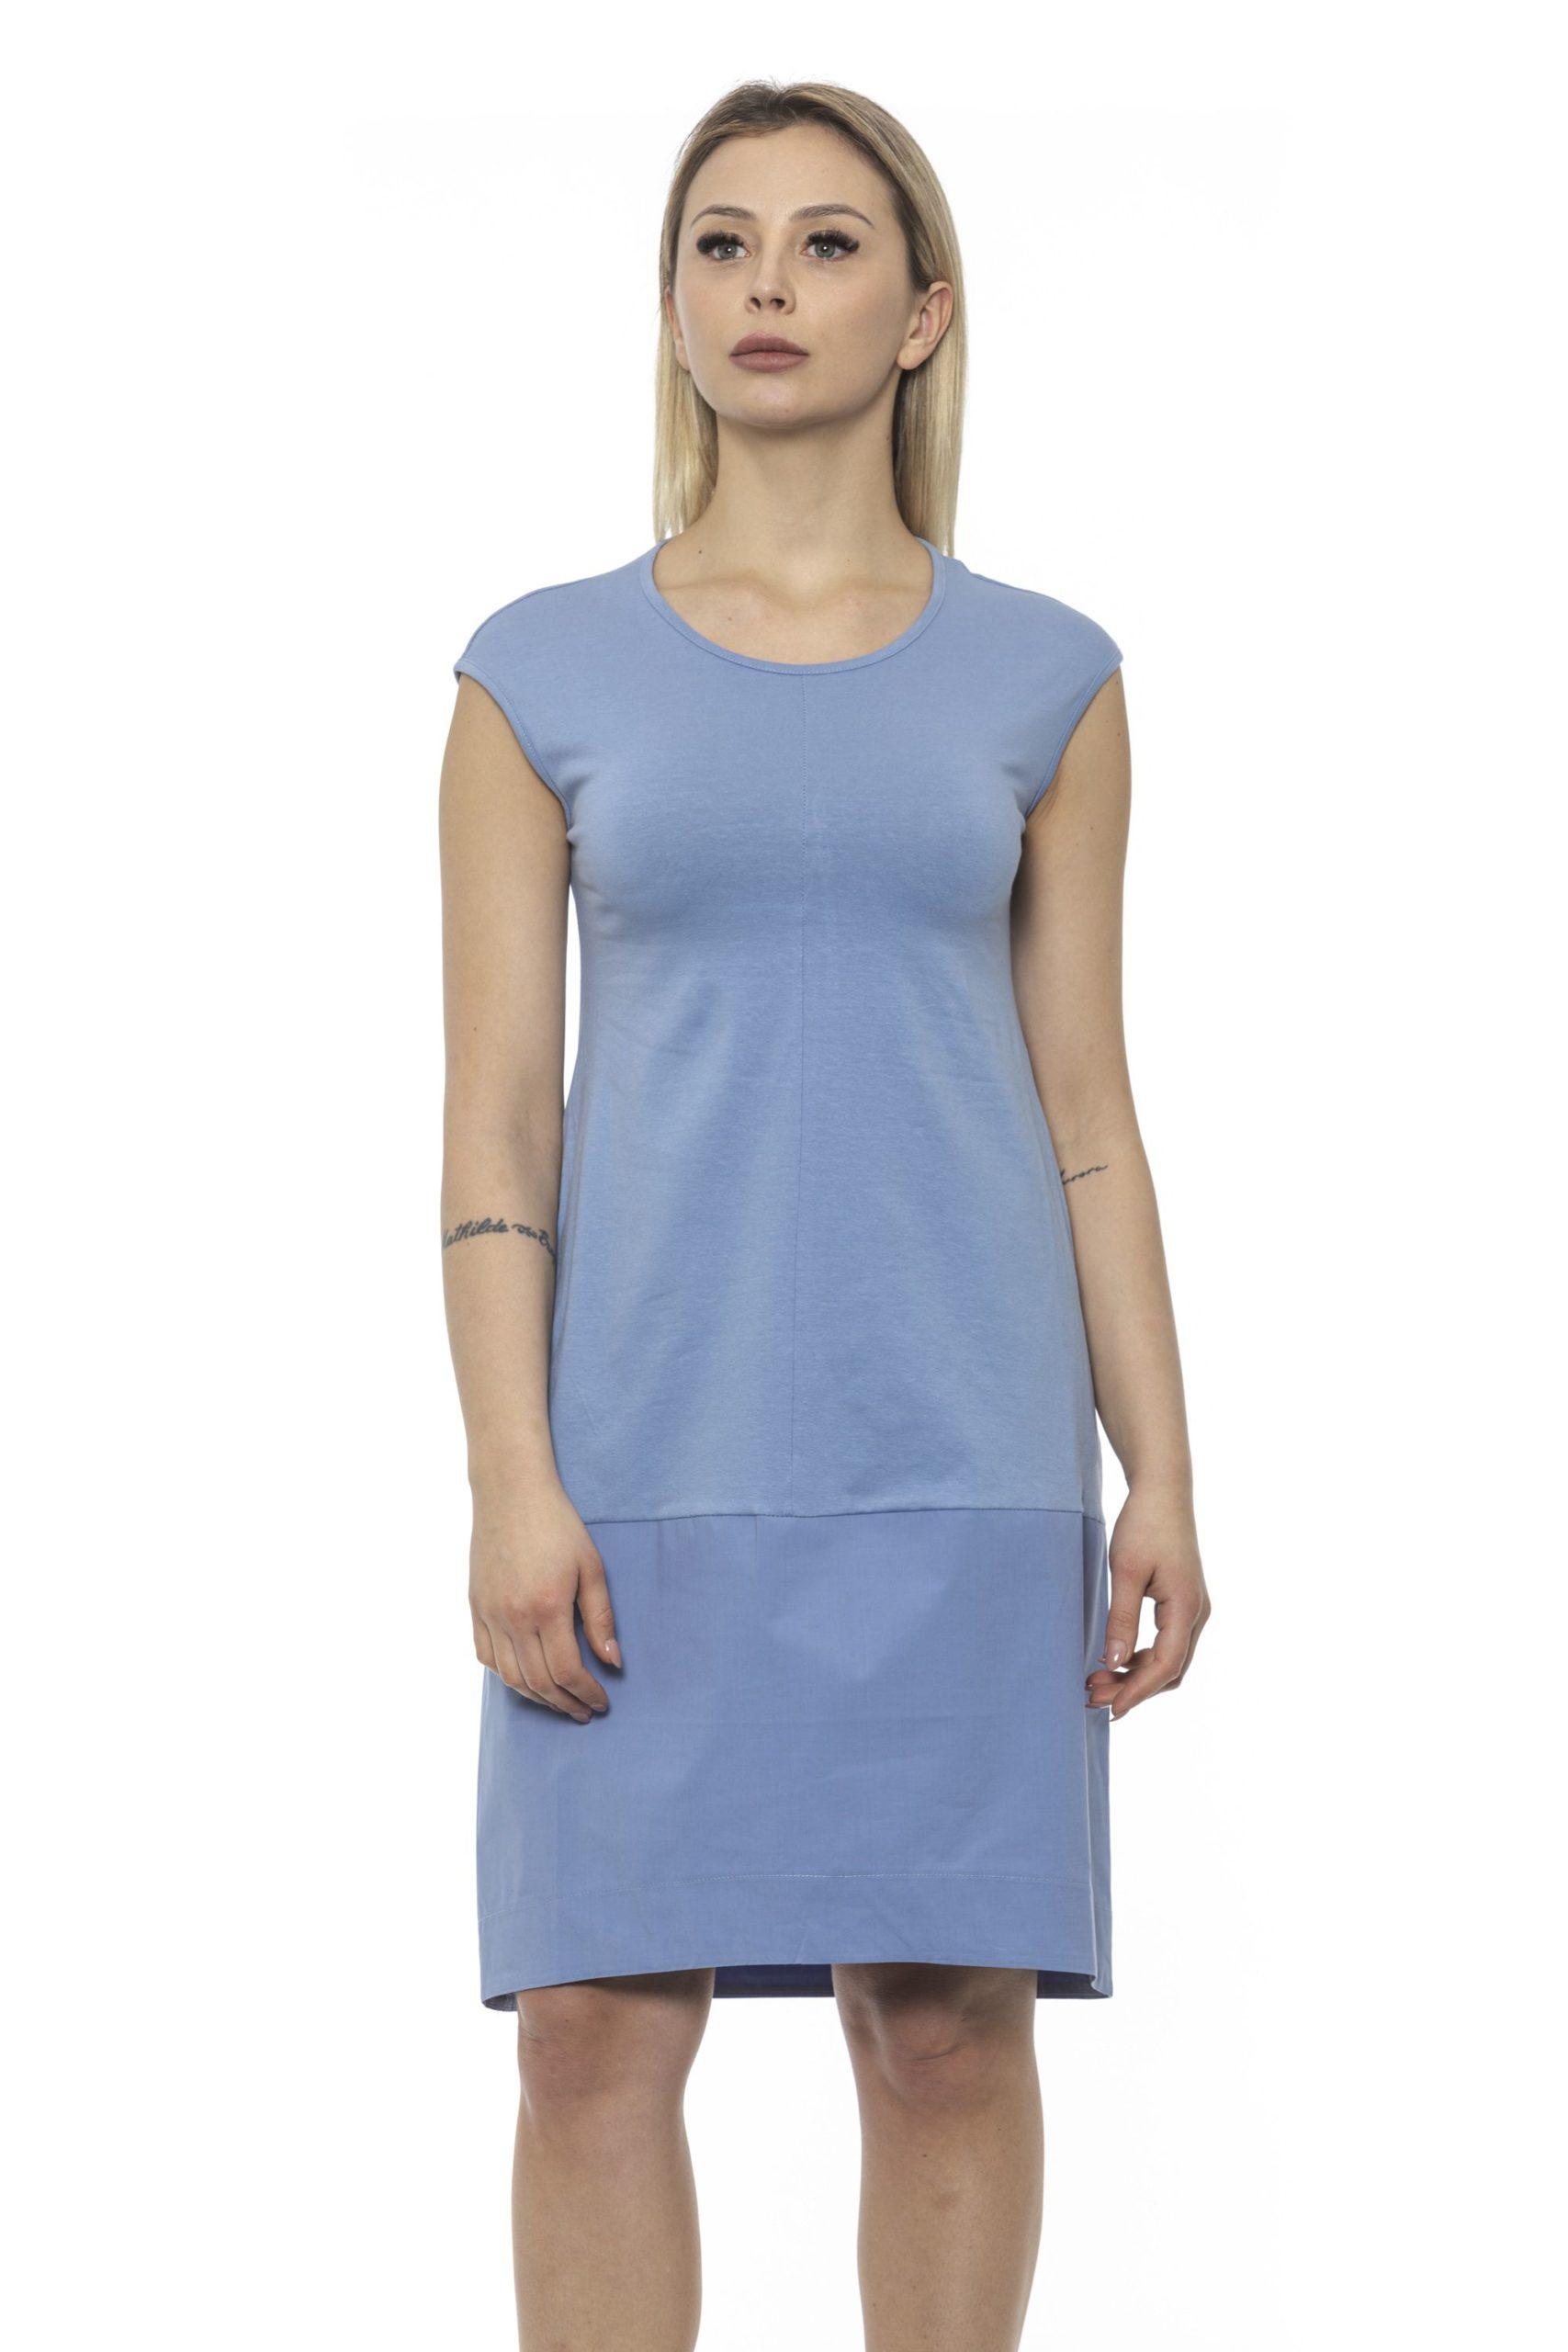 Alpha Studio Women's Chambray Dress Light Blue AL1375003 - IT40 | XS